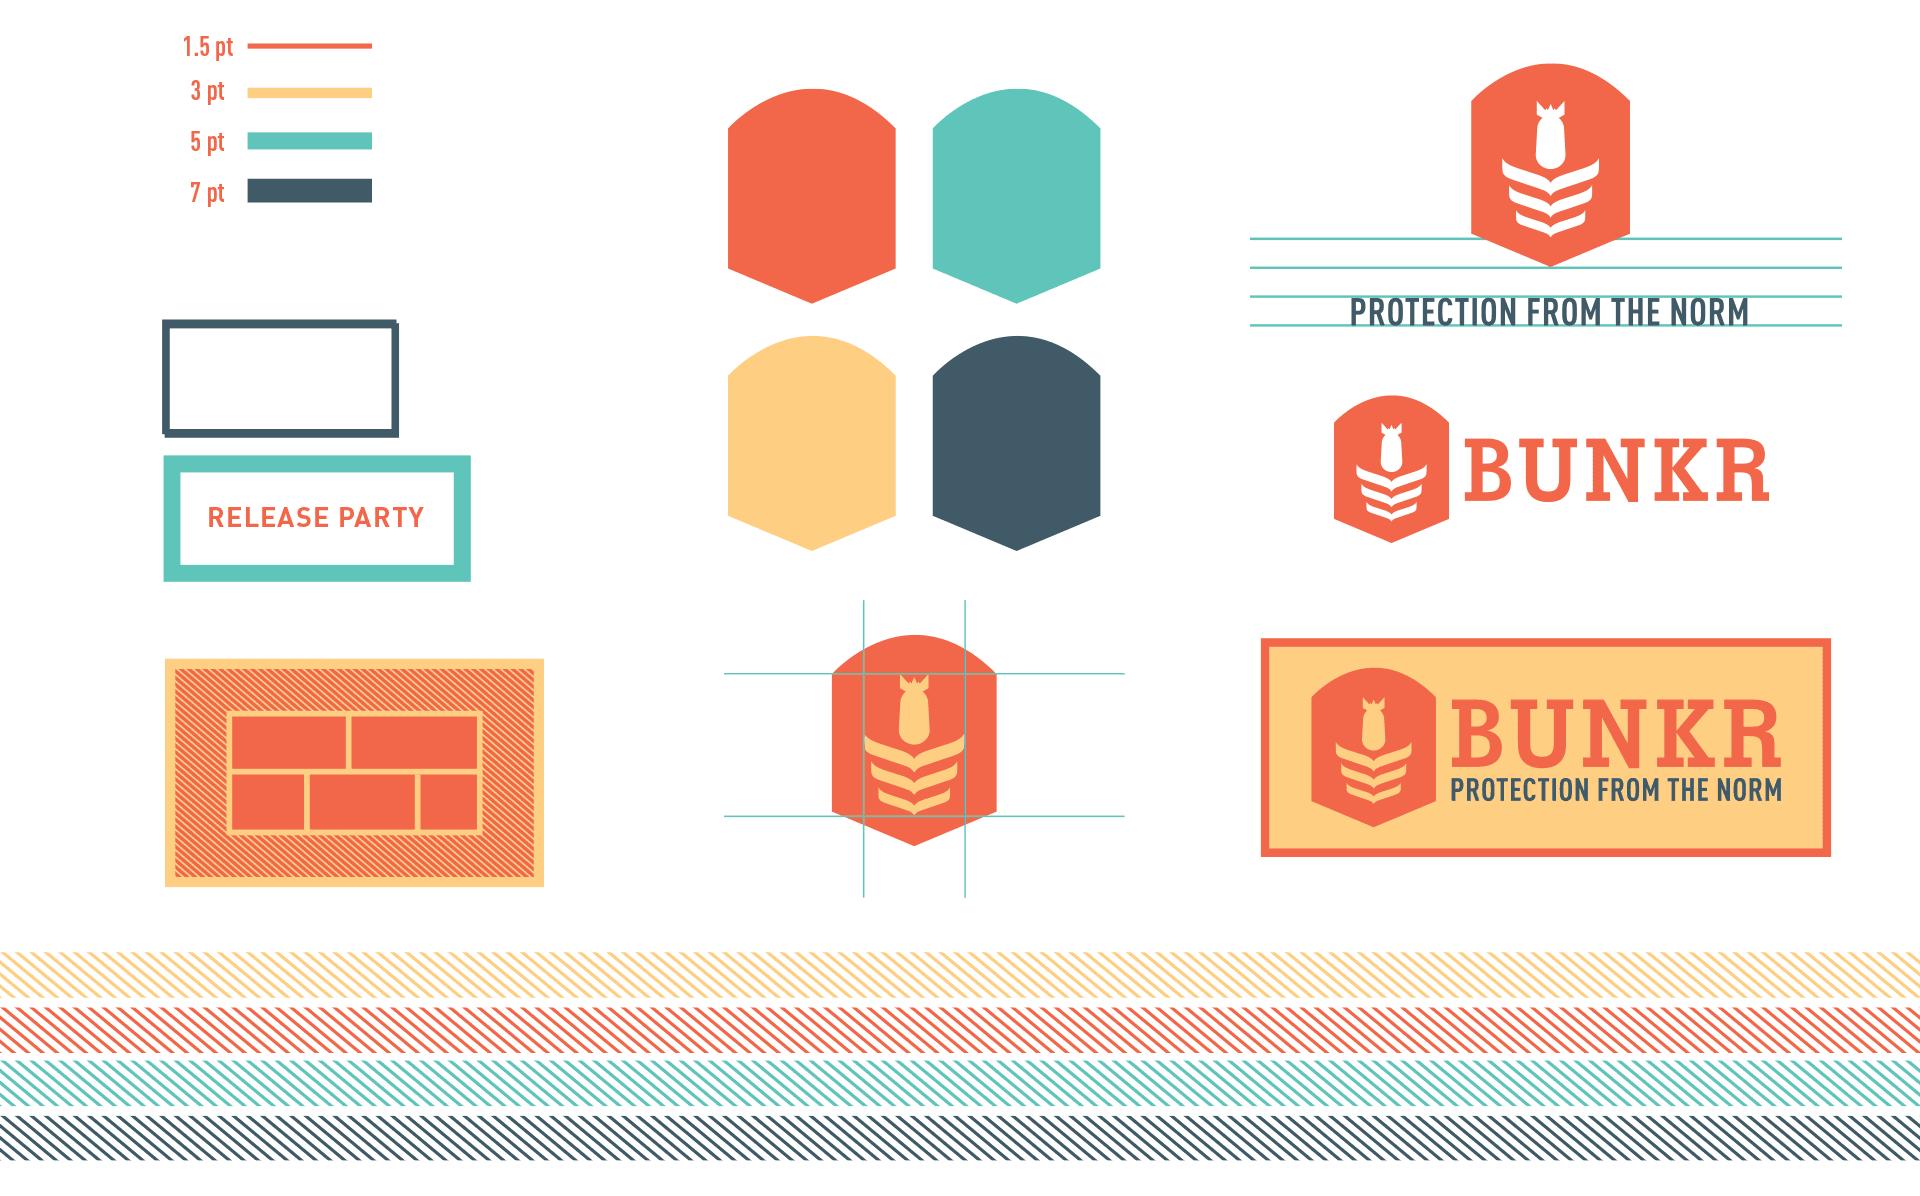 bunkr-graphicelements